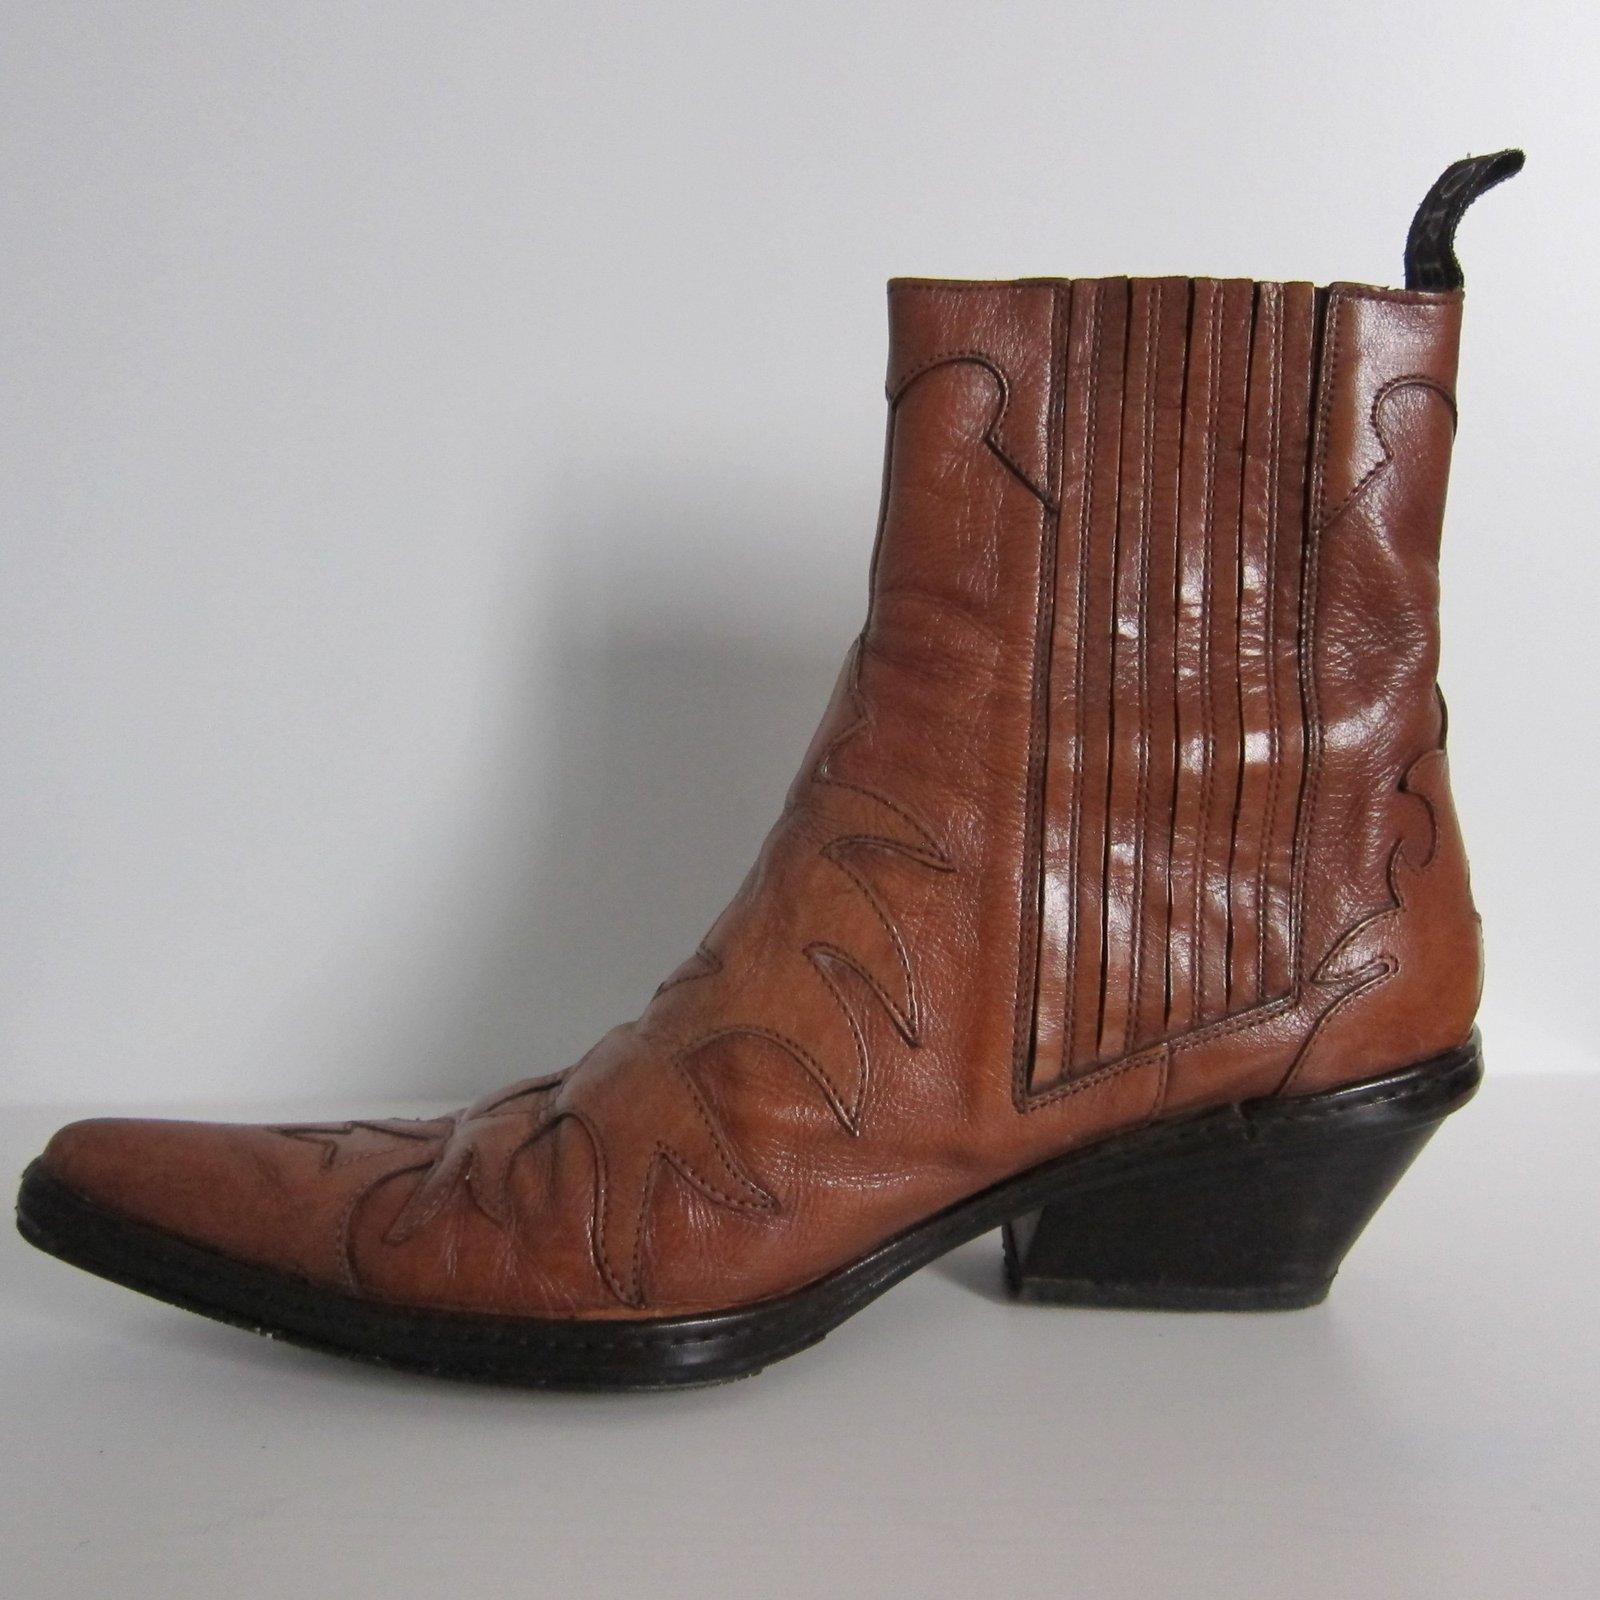 sartore cowboy boots